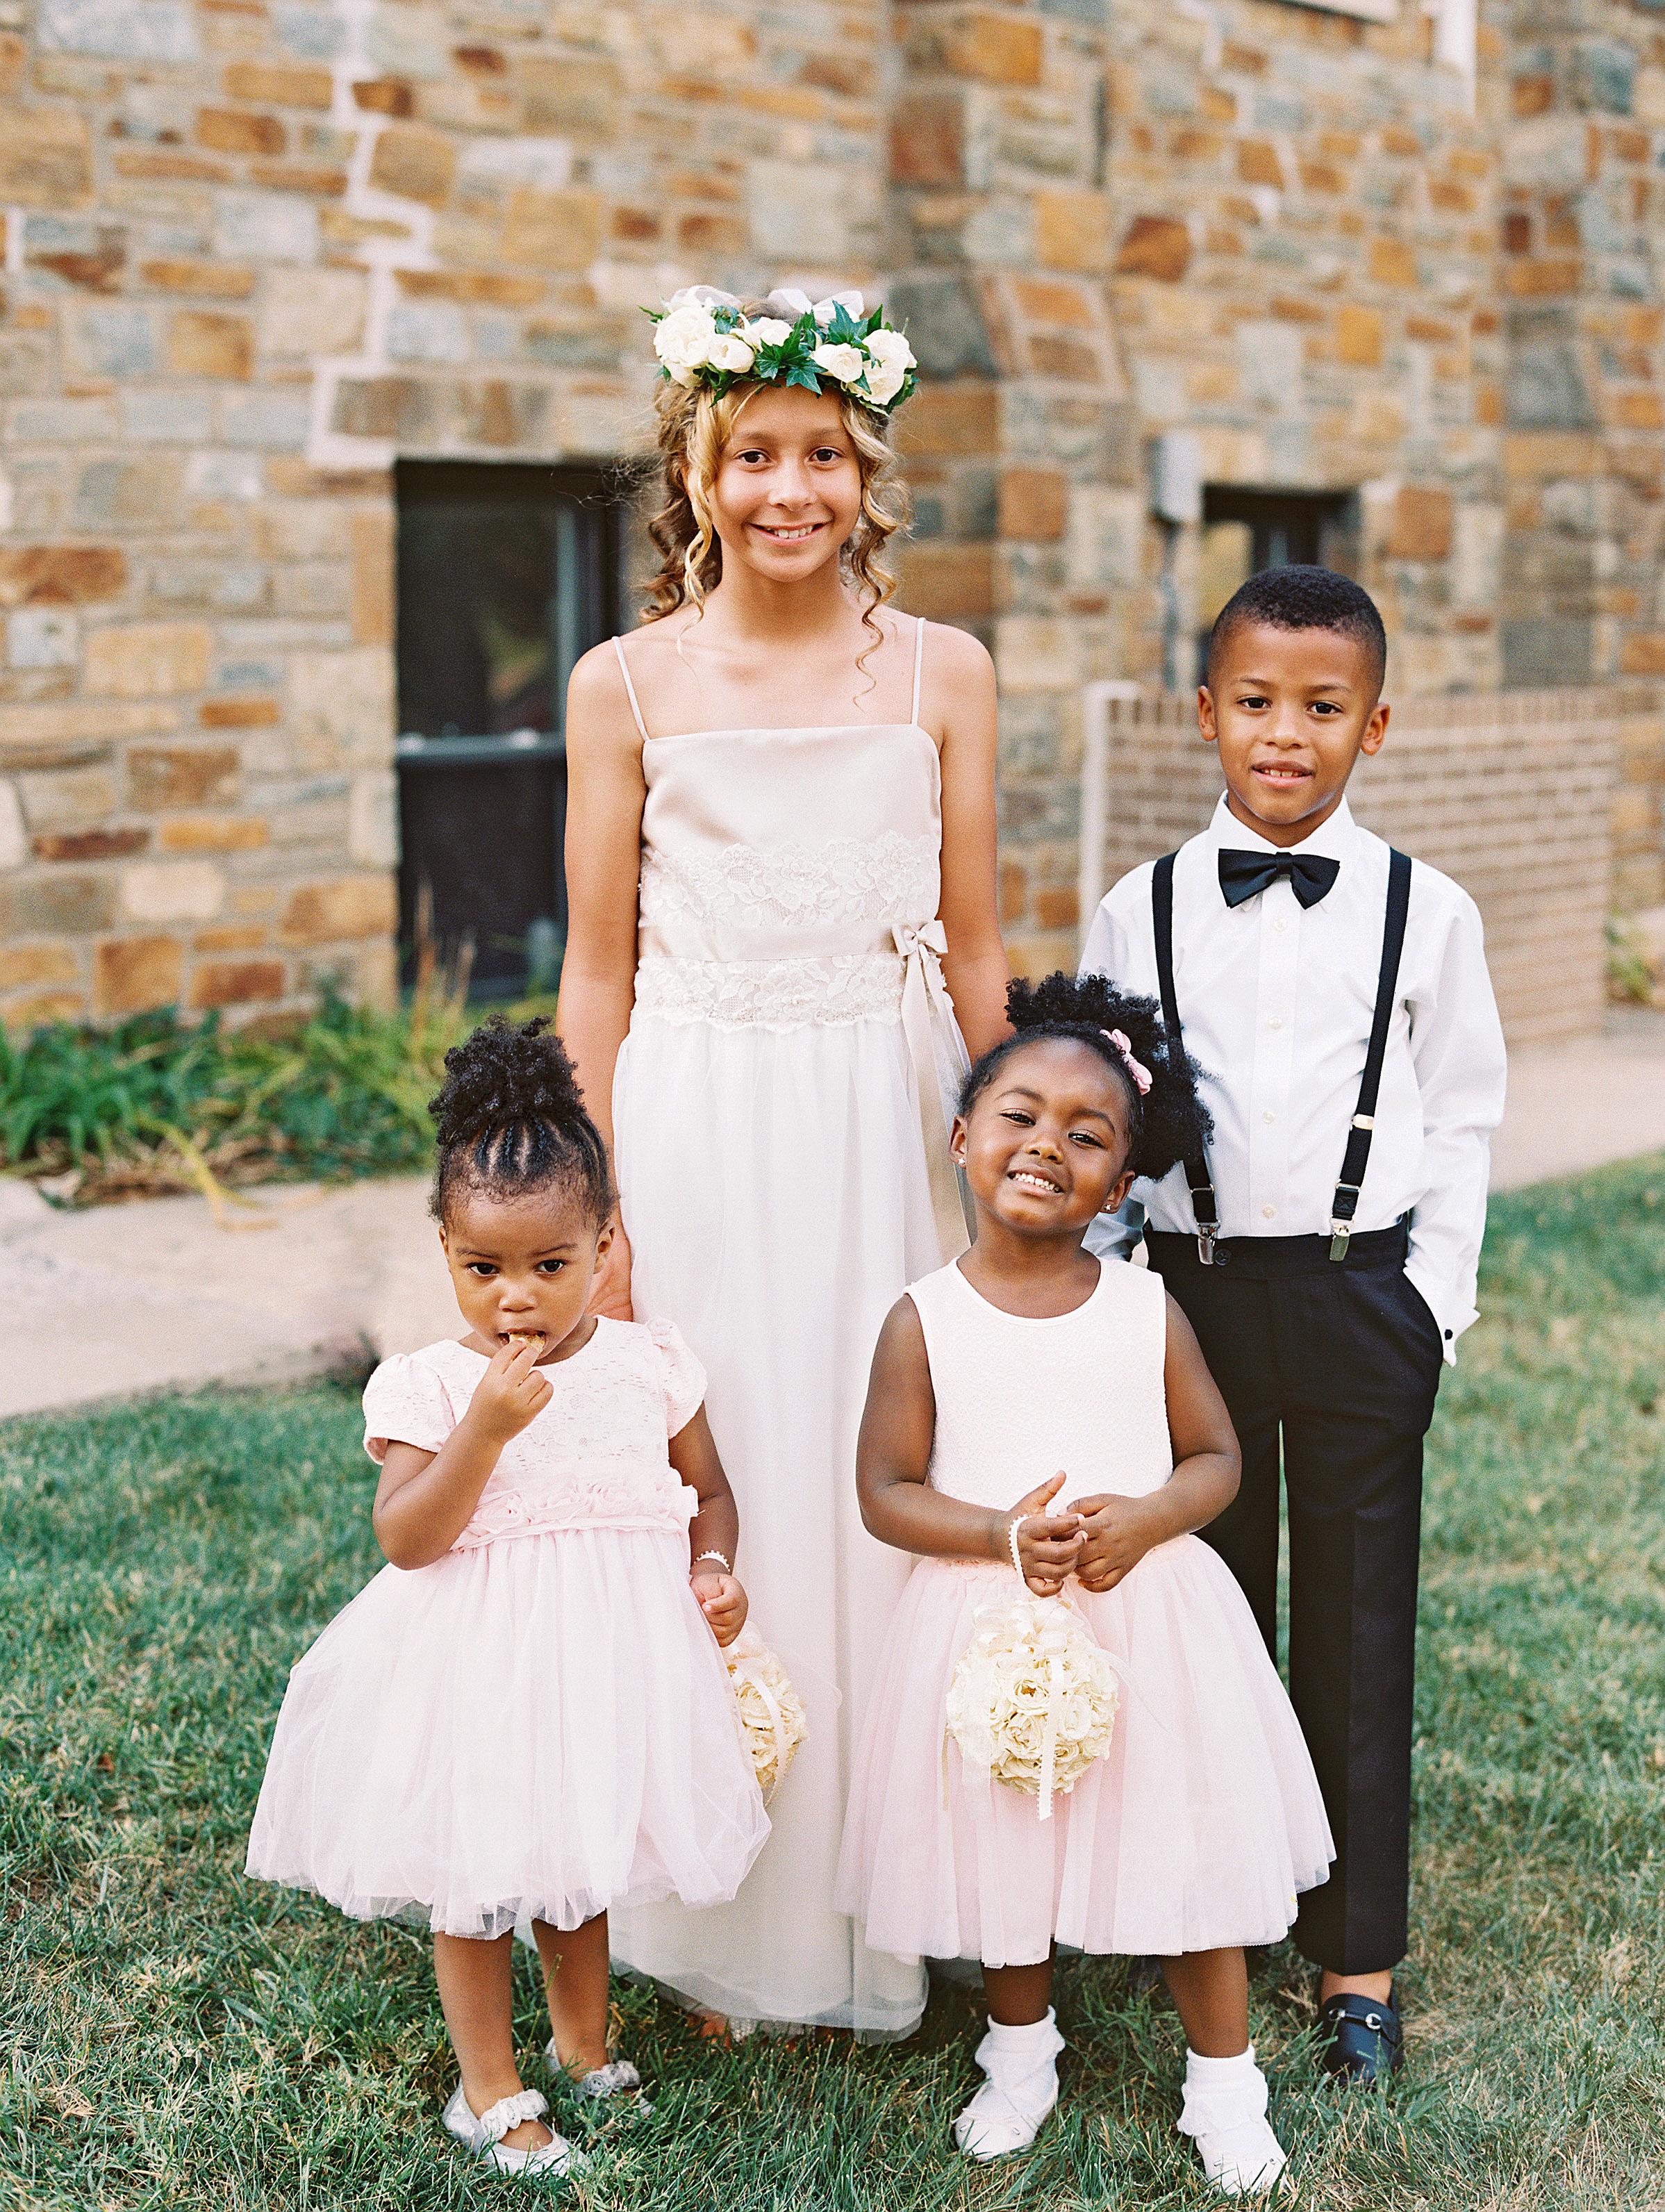 lindsey william wedding dc flower girls ring bearer